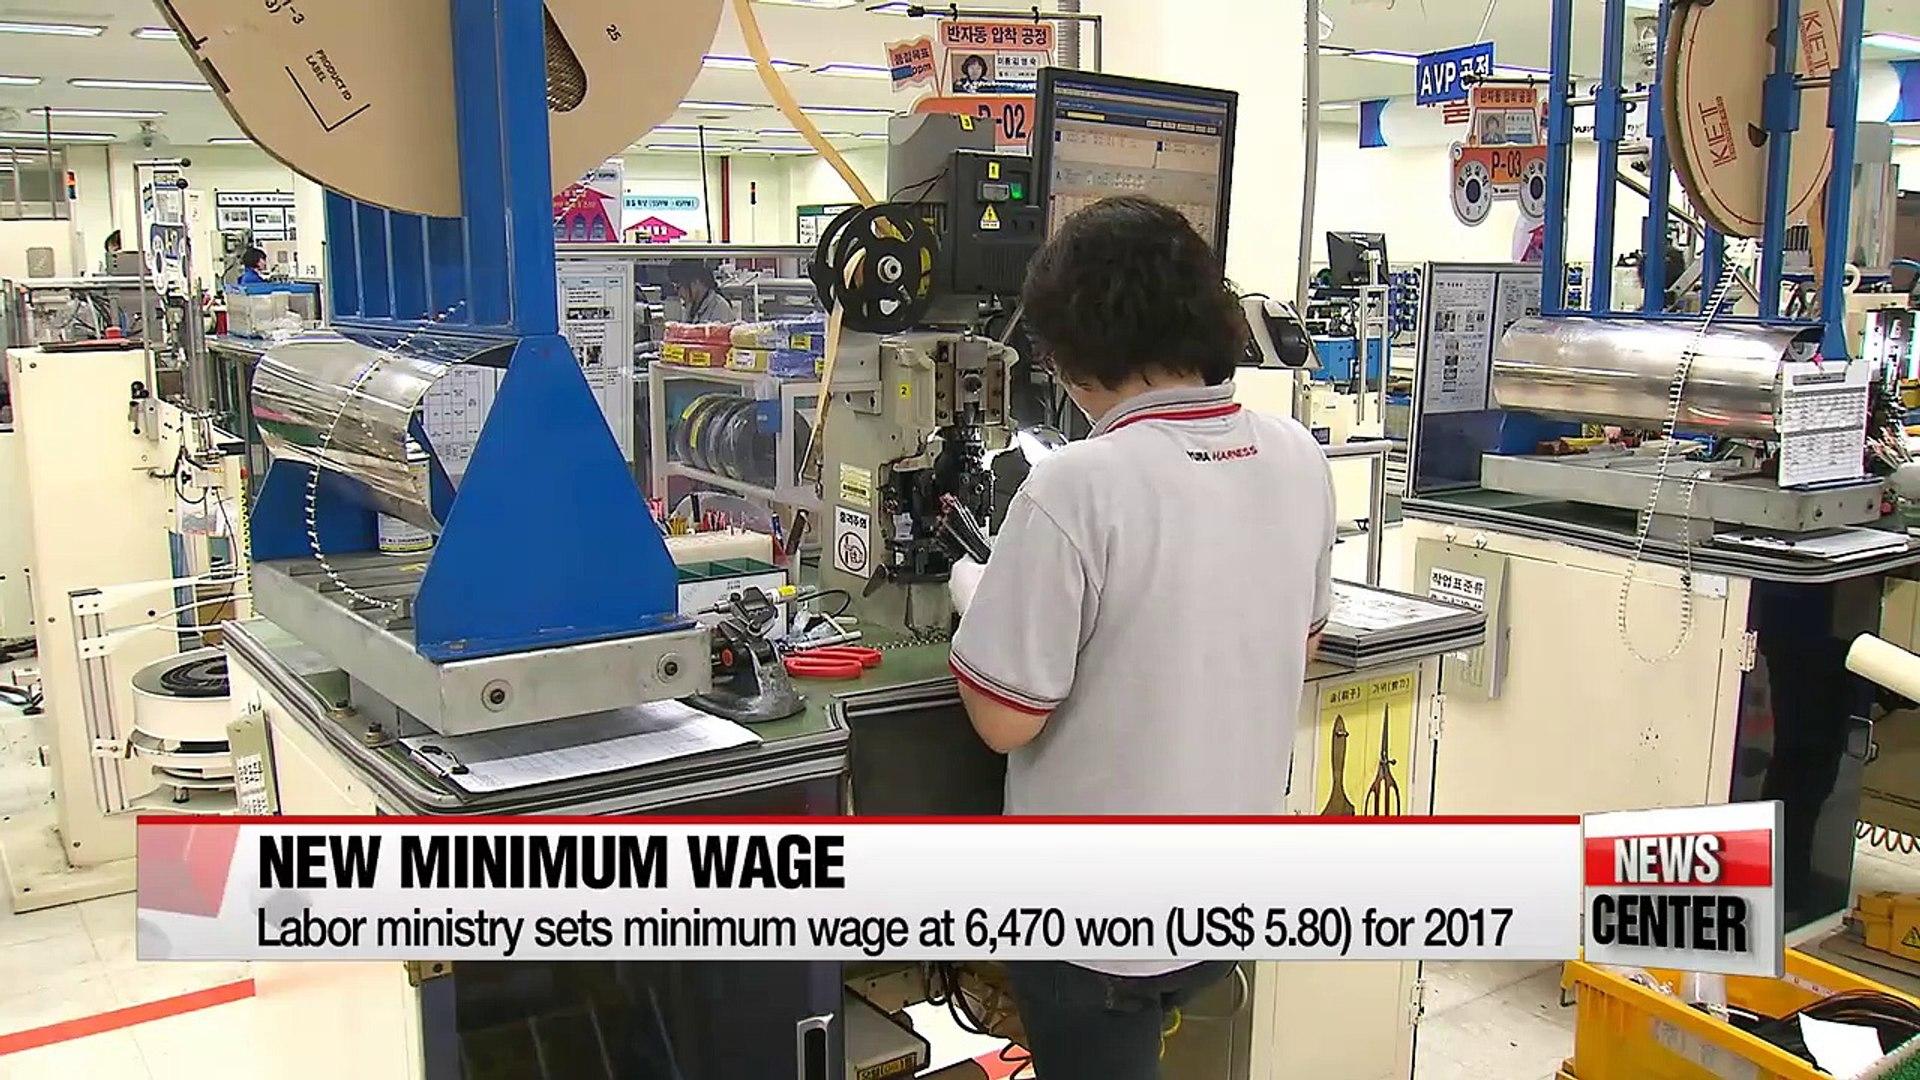 Minimum wage set at 6,470 won (US$ 5.80) for 2017